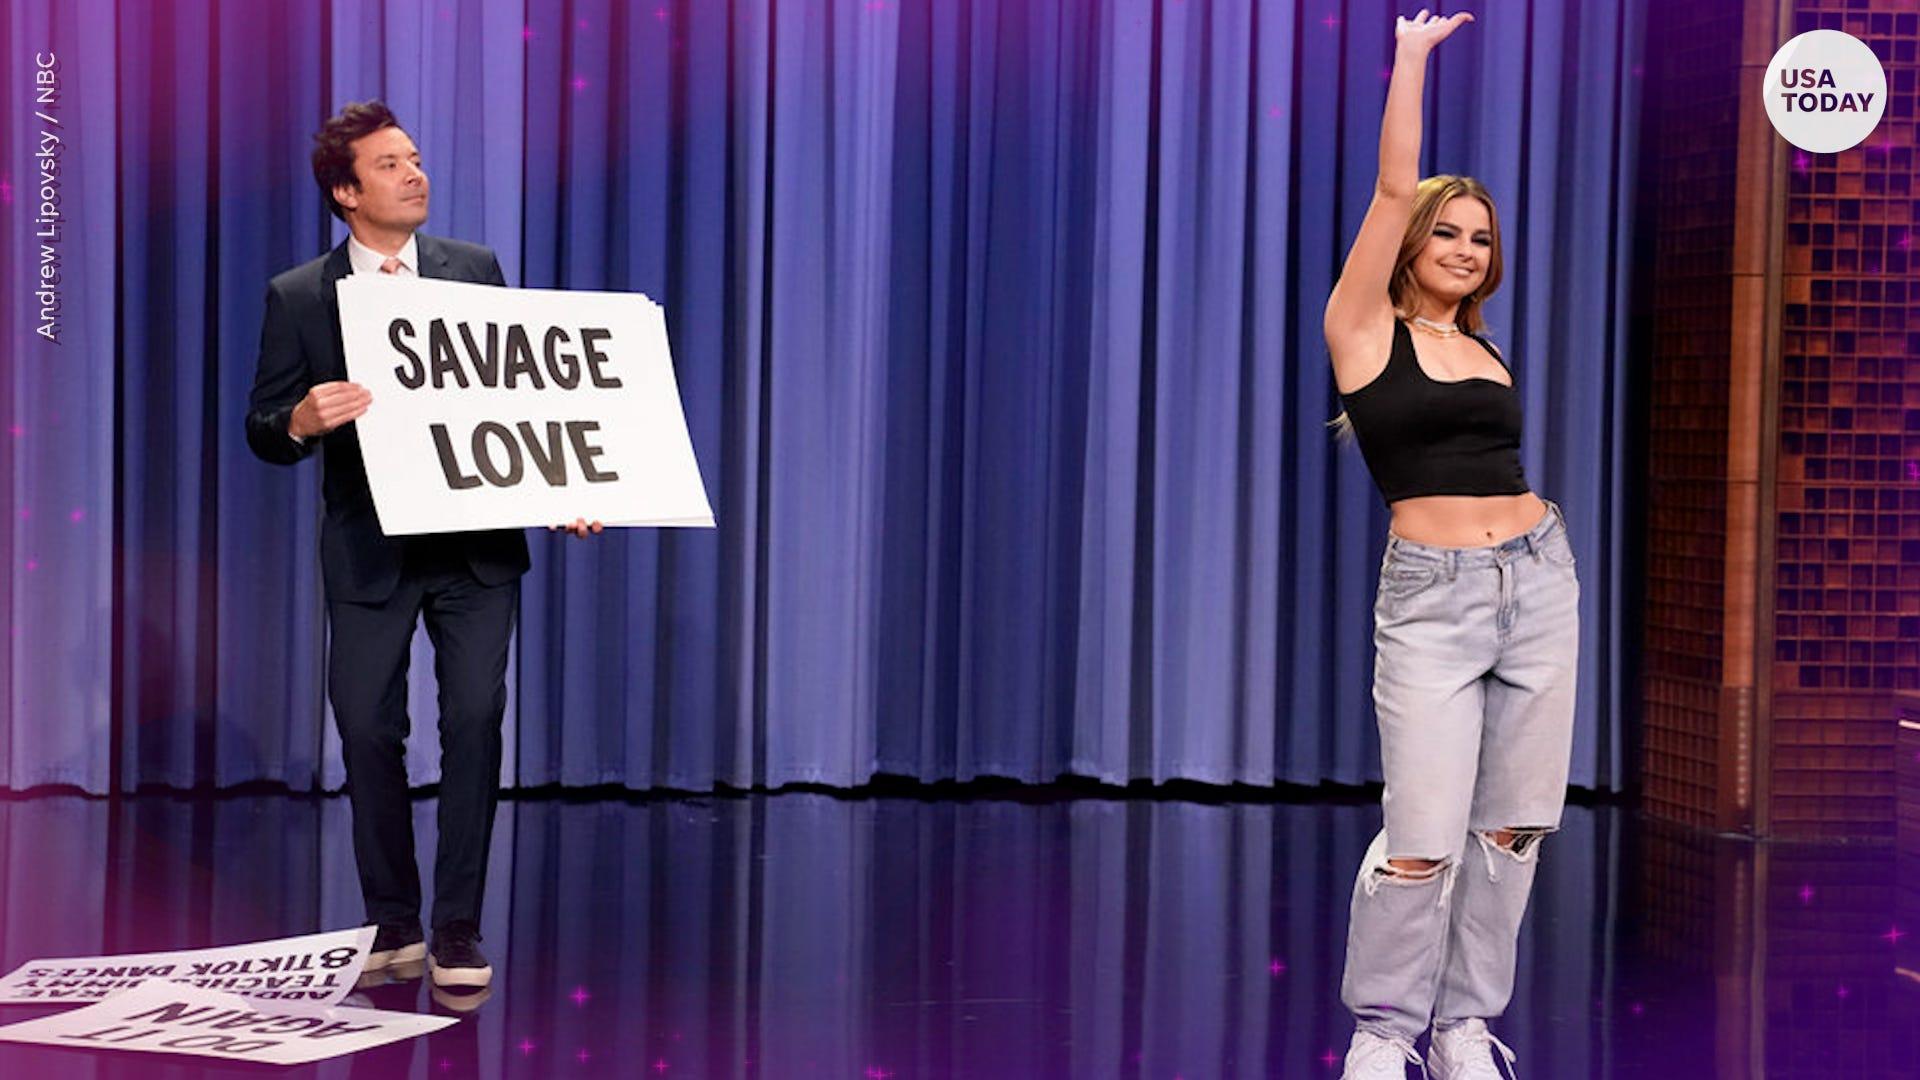 TikTok: Addison Rae's Jimmy Fallon clip drew backlash, Fallon responds